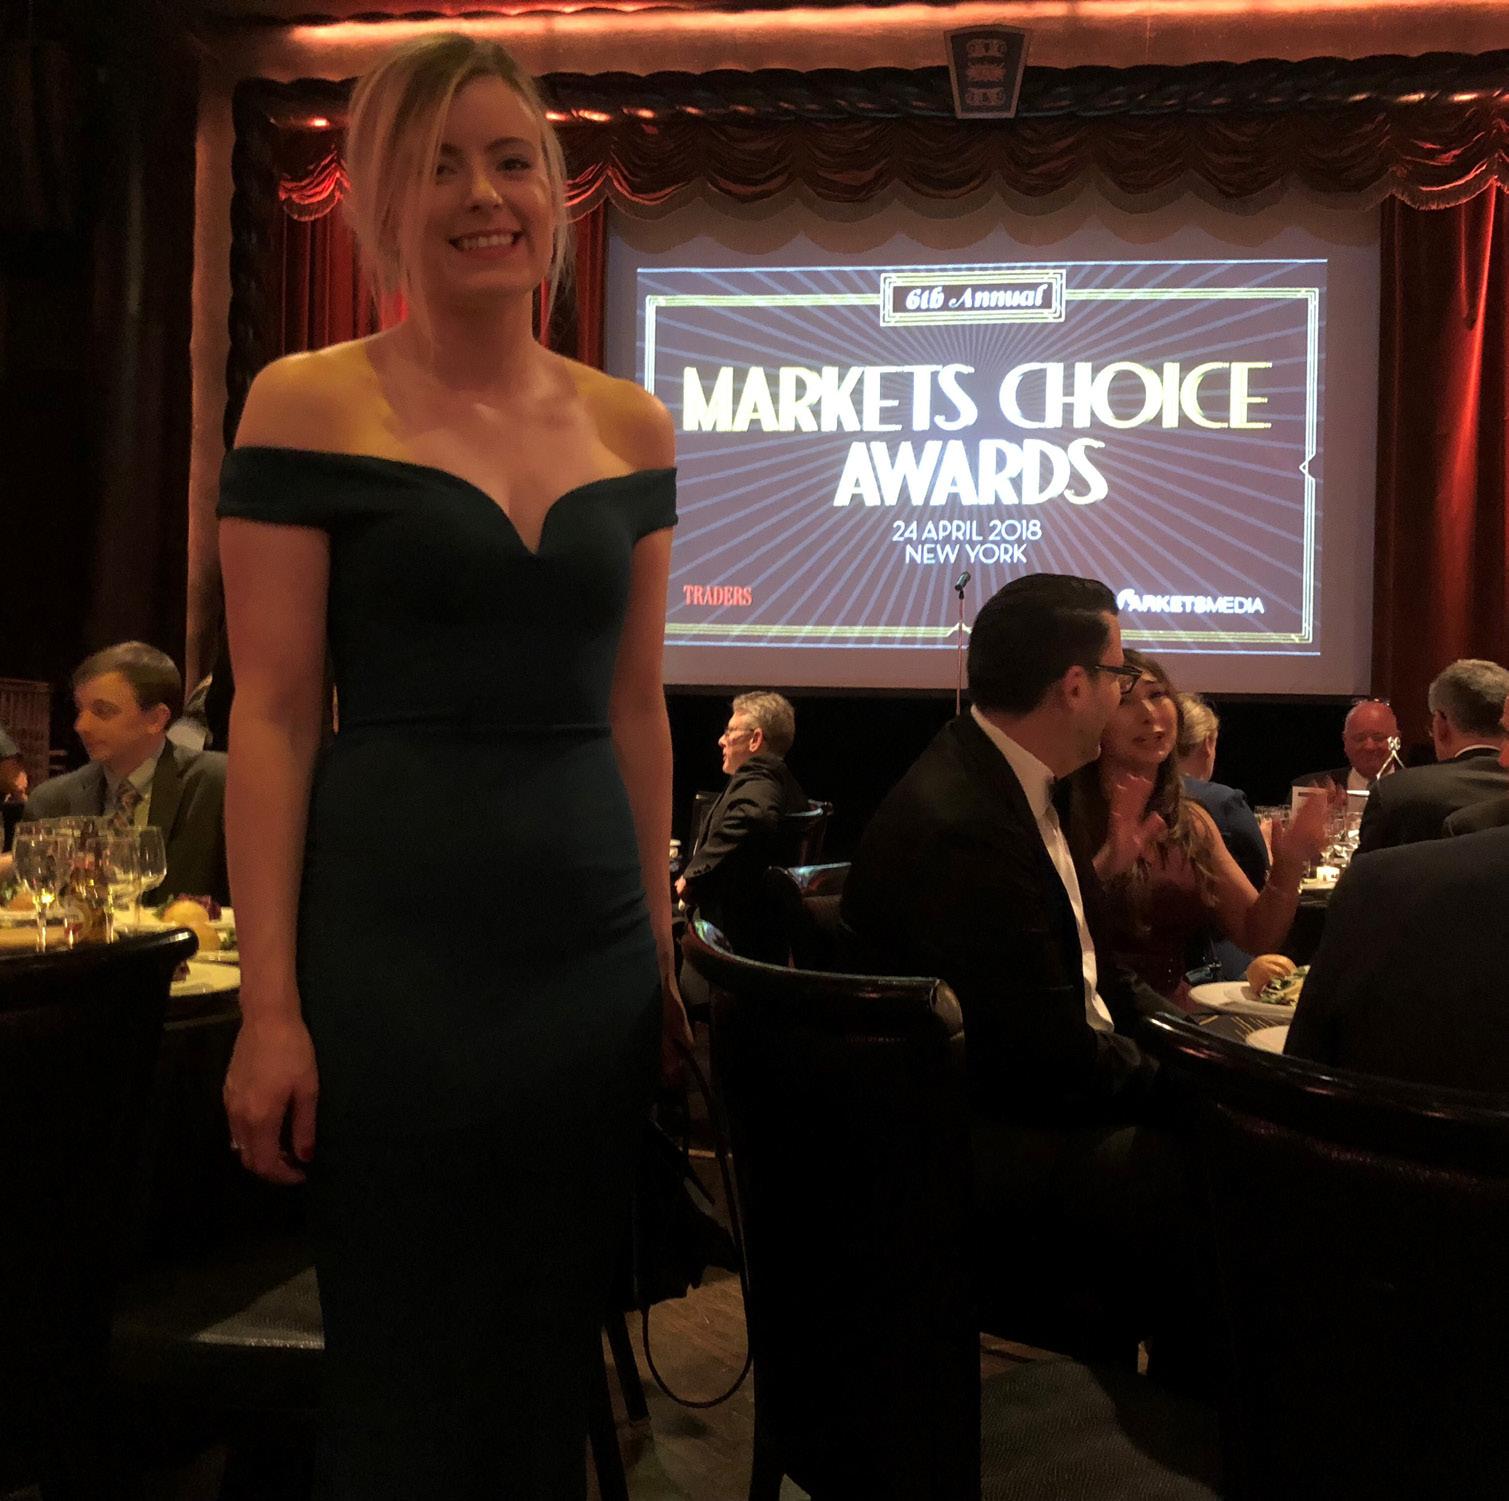 Alexandria McGrath of Vela recognized as a Rising Star